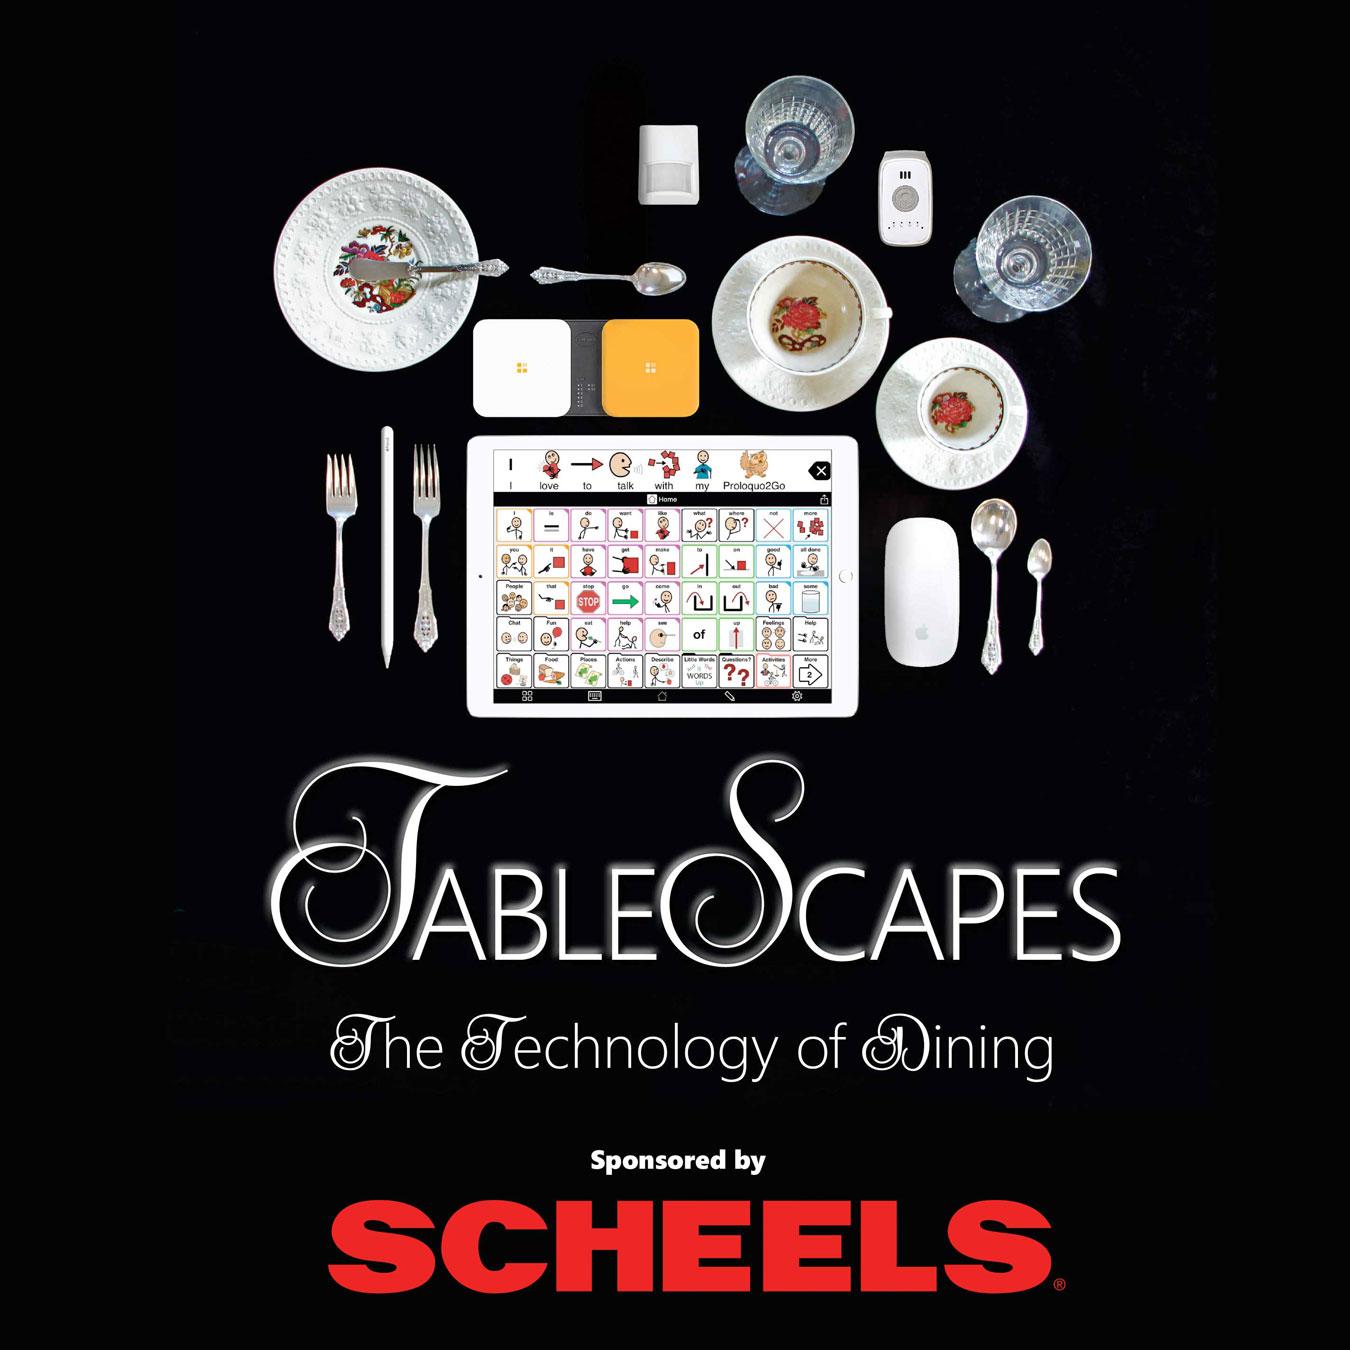 CCRI TableScapes